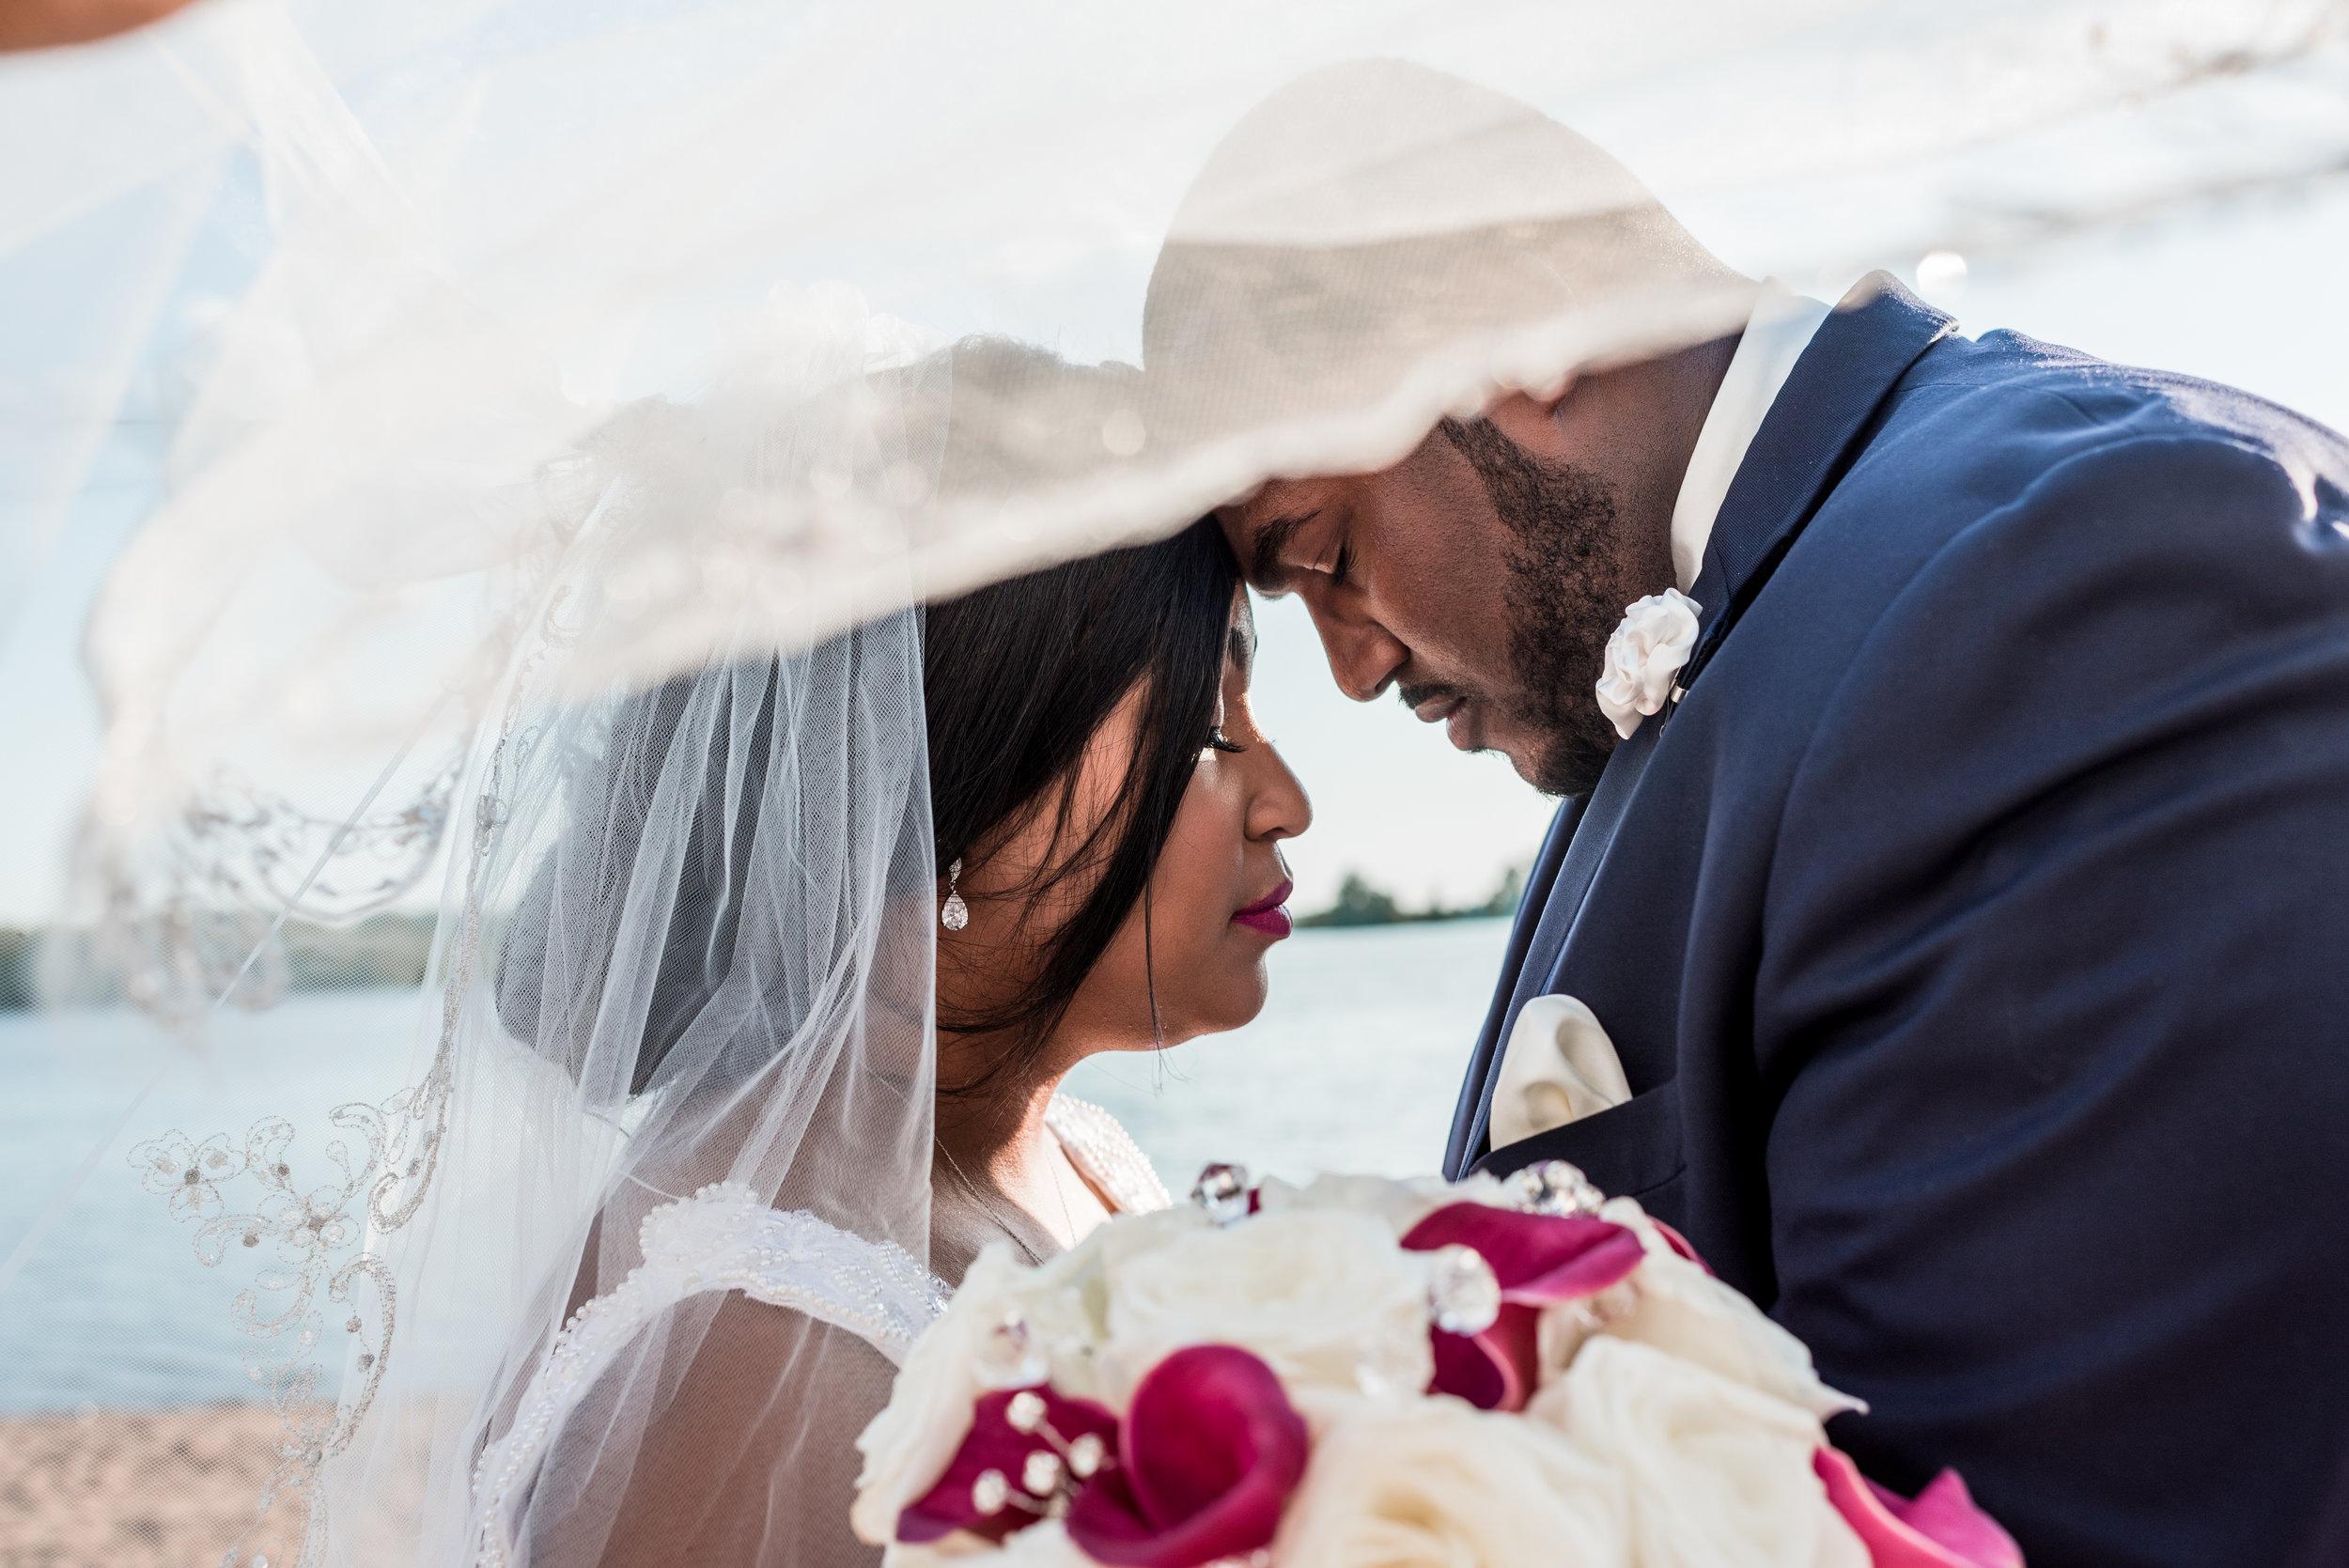 st-louis-wedding-photographer-orlandos-317.jpg